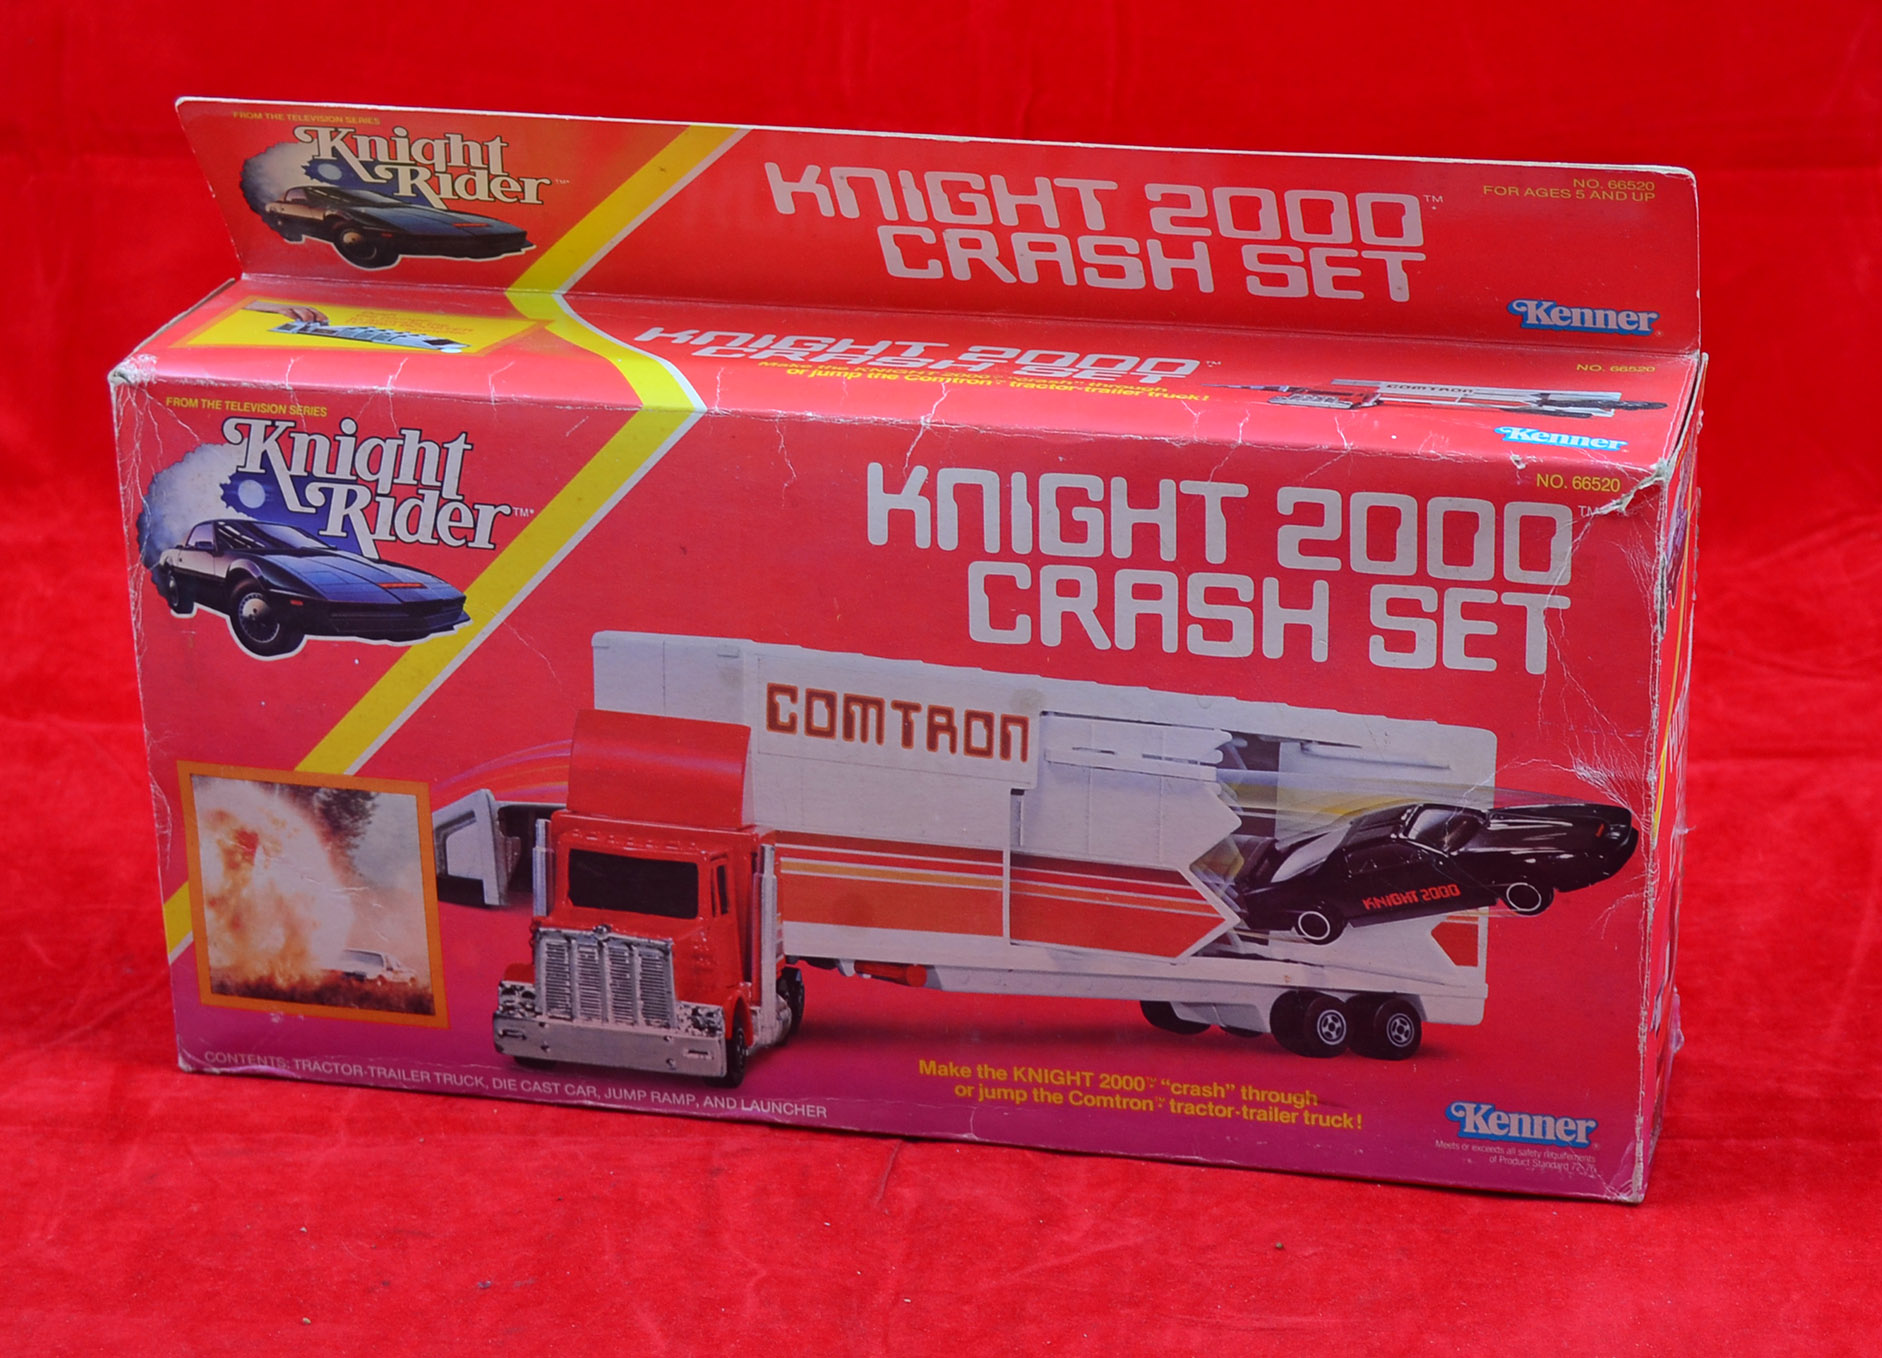 Kenner No Knight Rider Knight 2000 Crash Set consists of